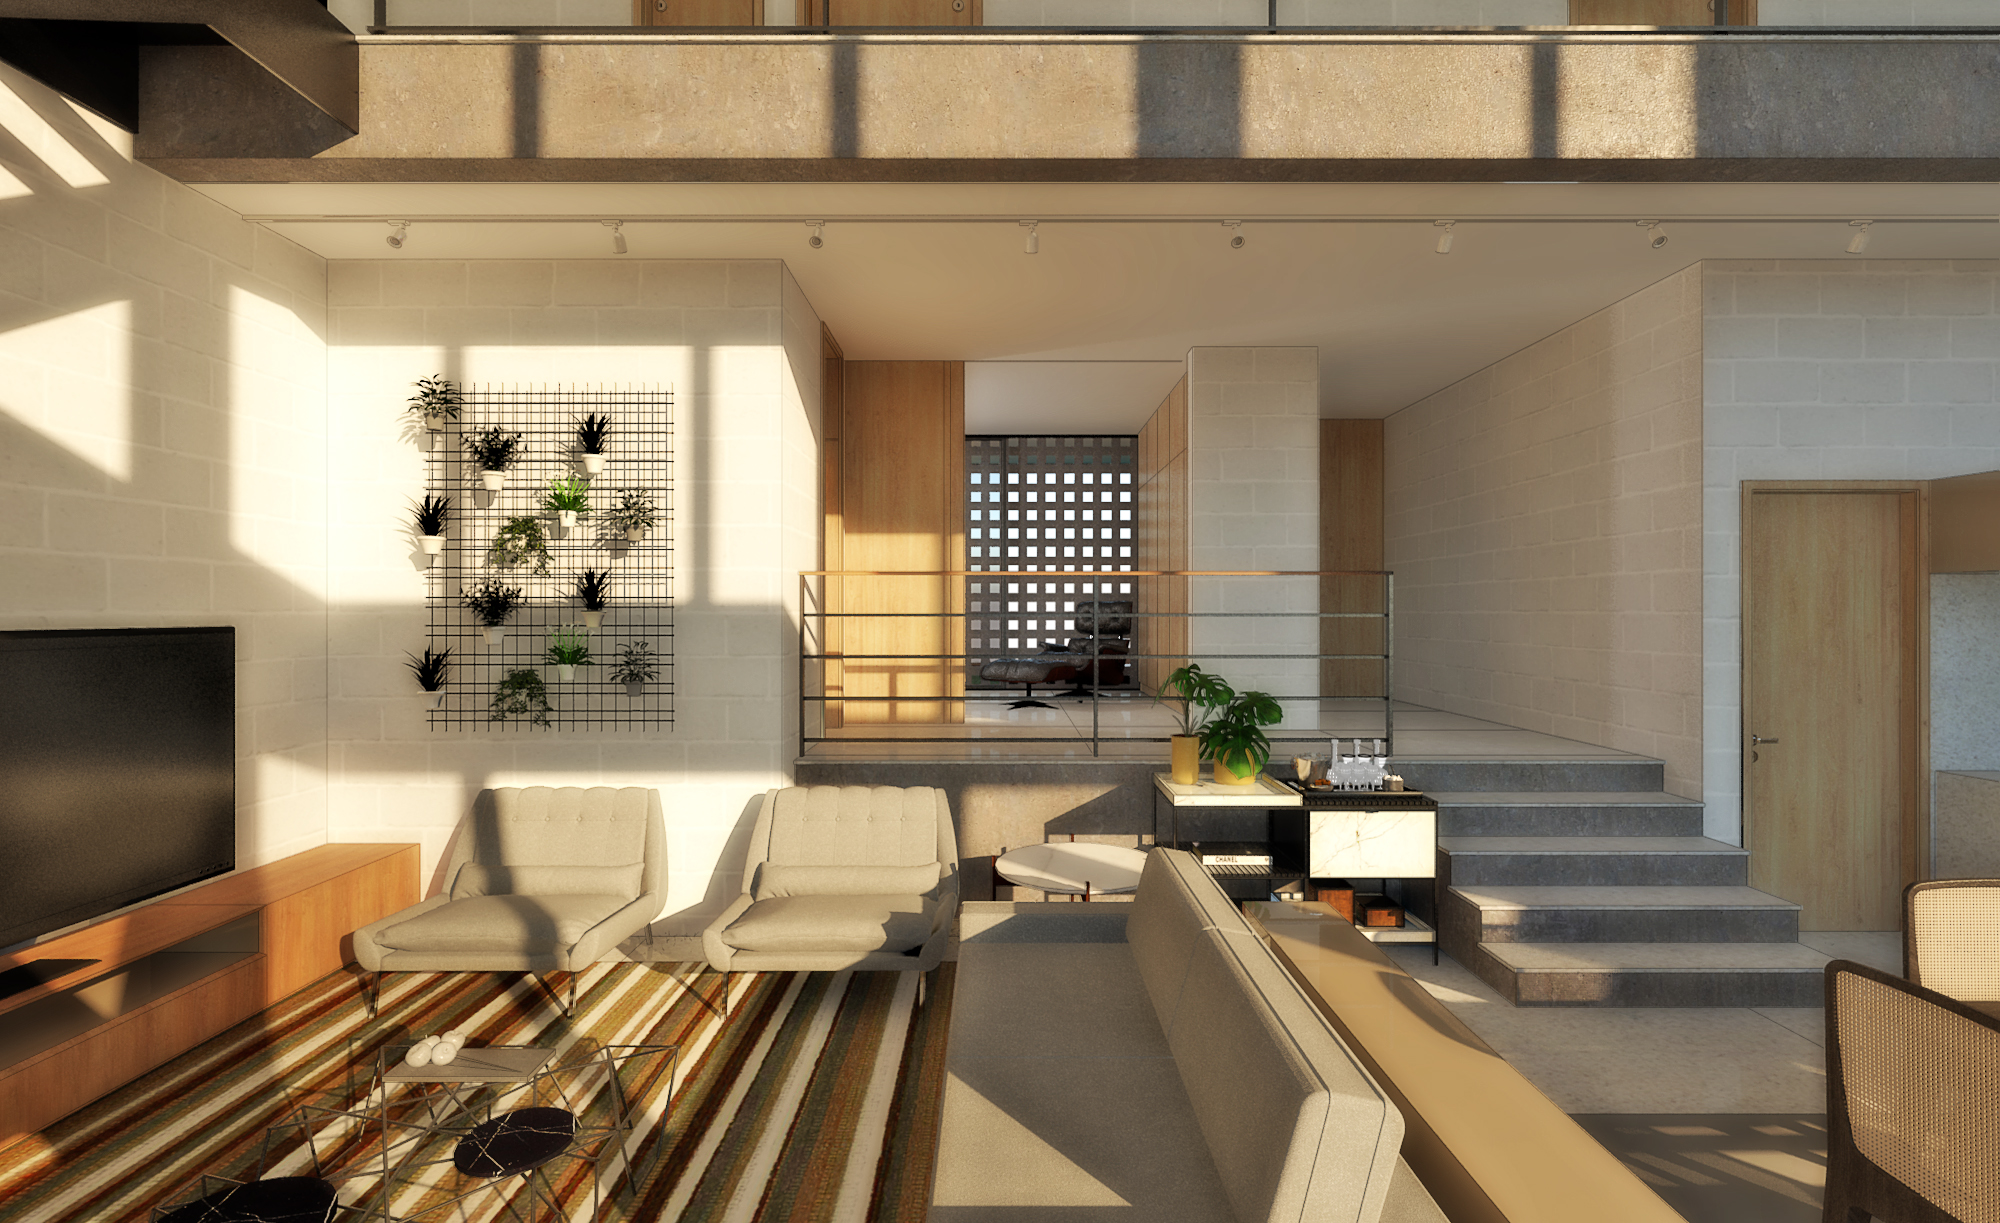 residencia-tn-daniel-carvalho-arquiteto-4